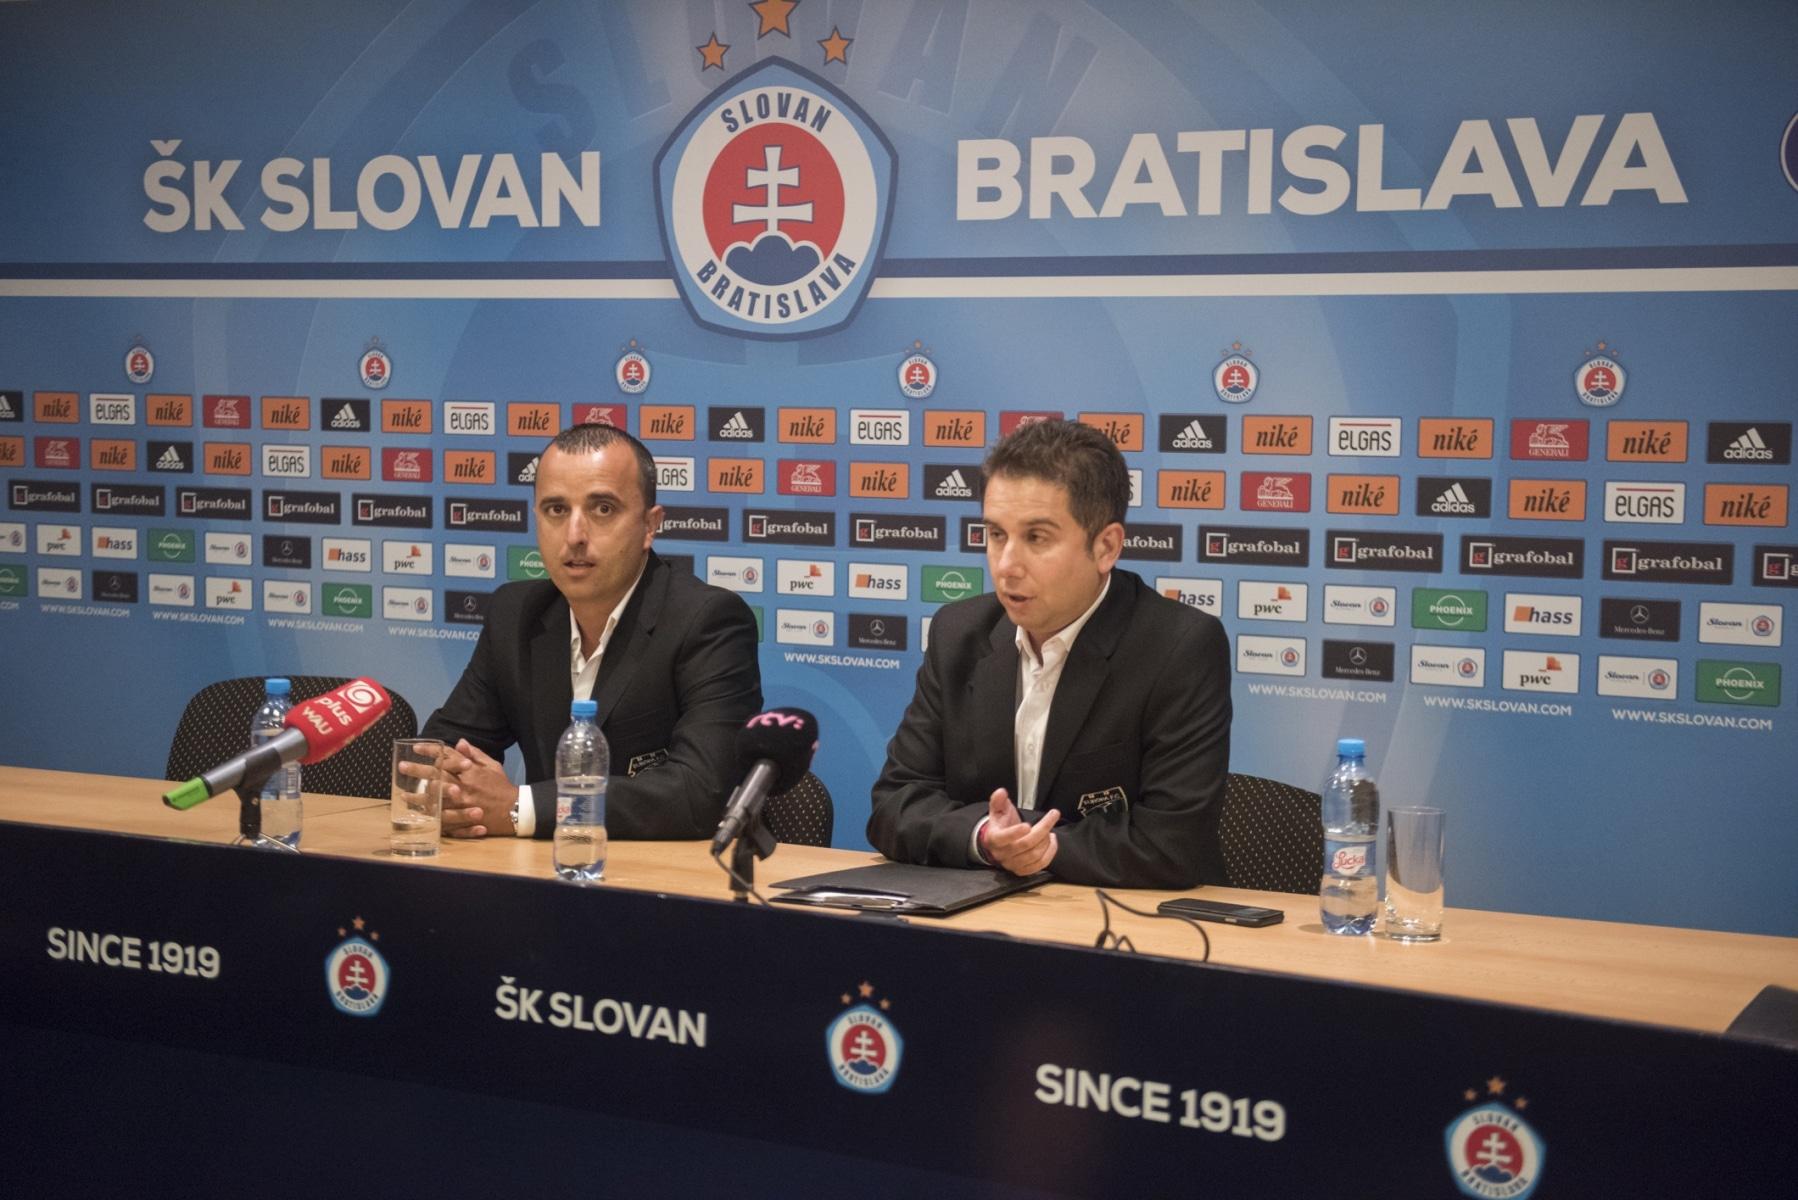 sk-slovan-bratislava-europa-fc-gibraltar-09072015-11_19563737932_o